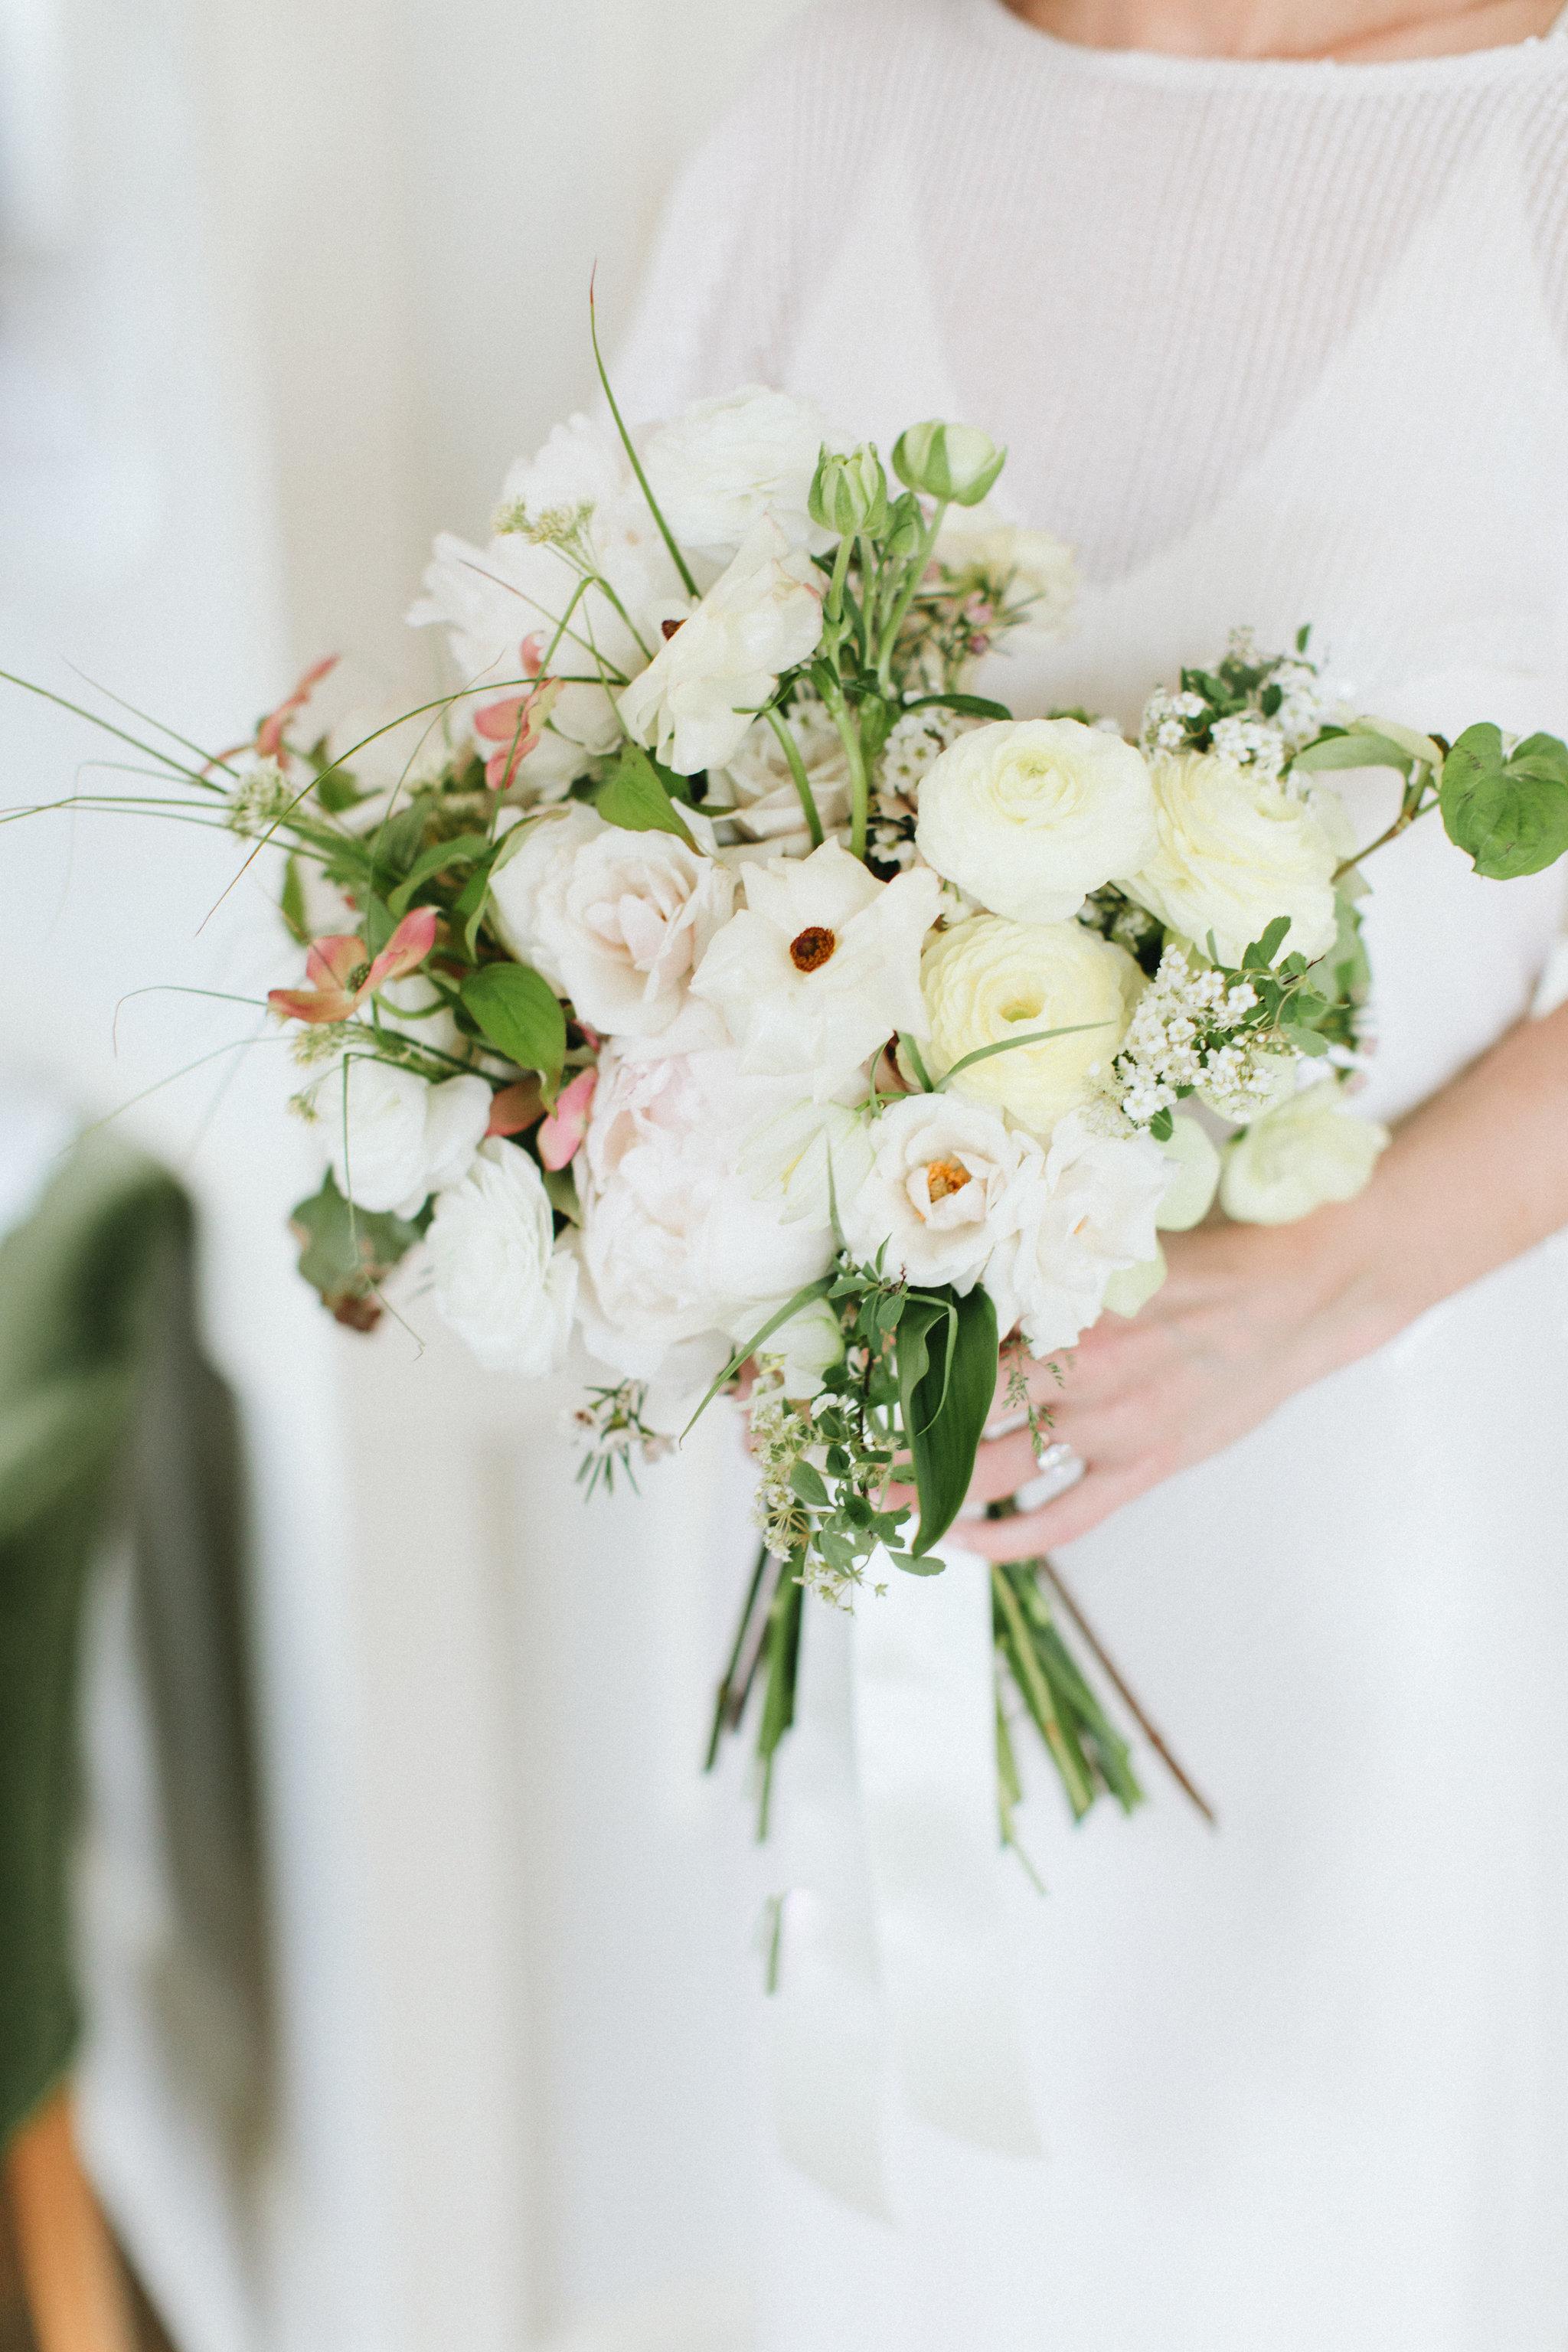 bowery-hotel-wedding-jove-meyer-events-019.jpg